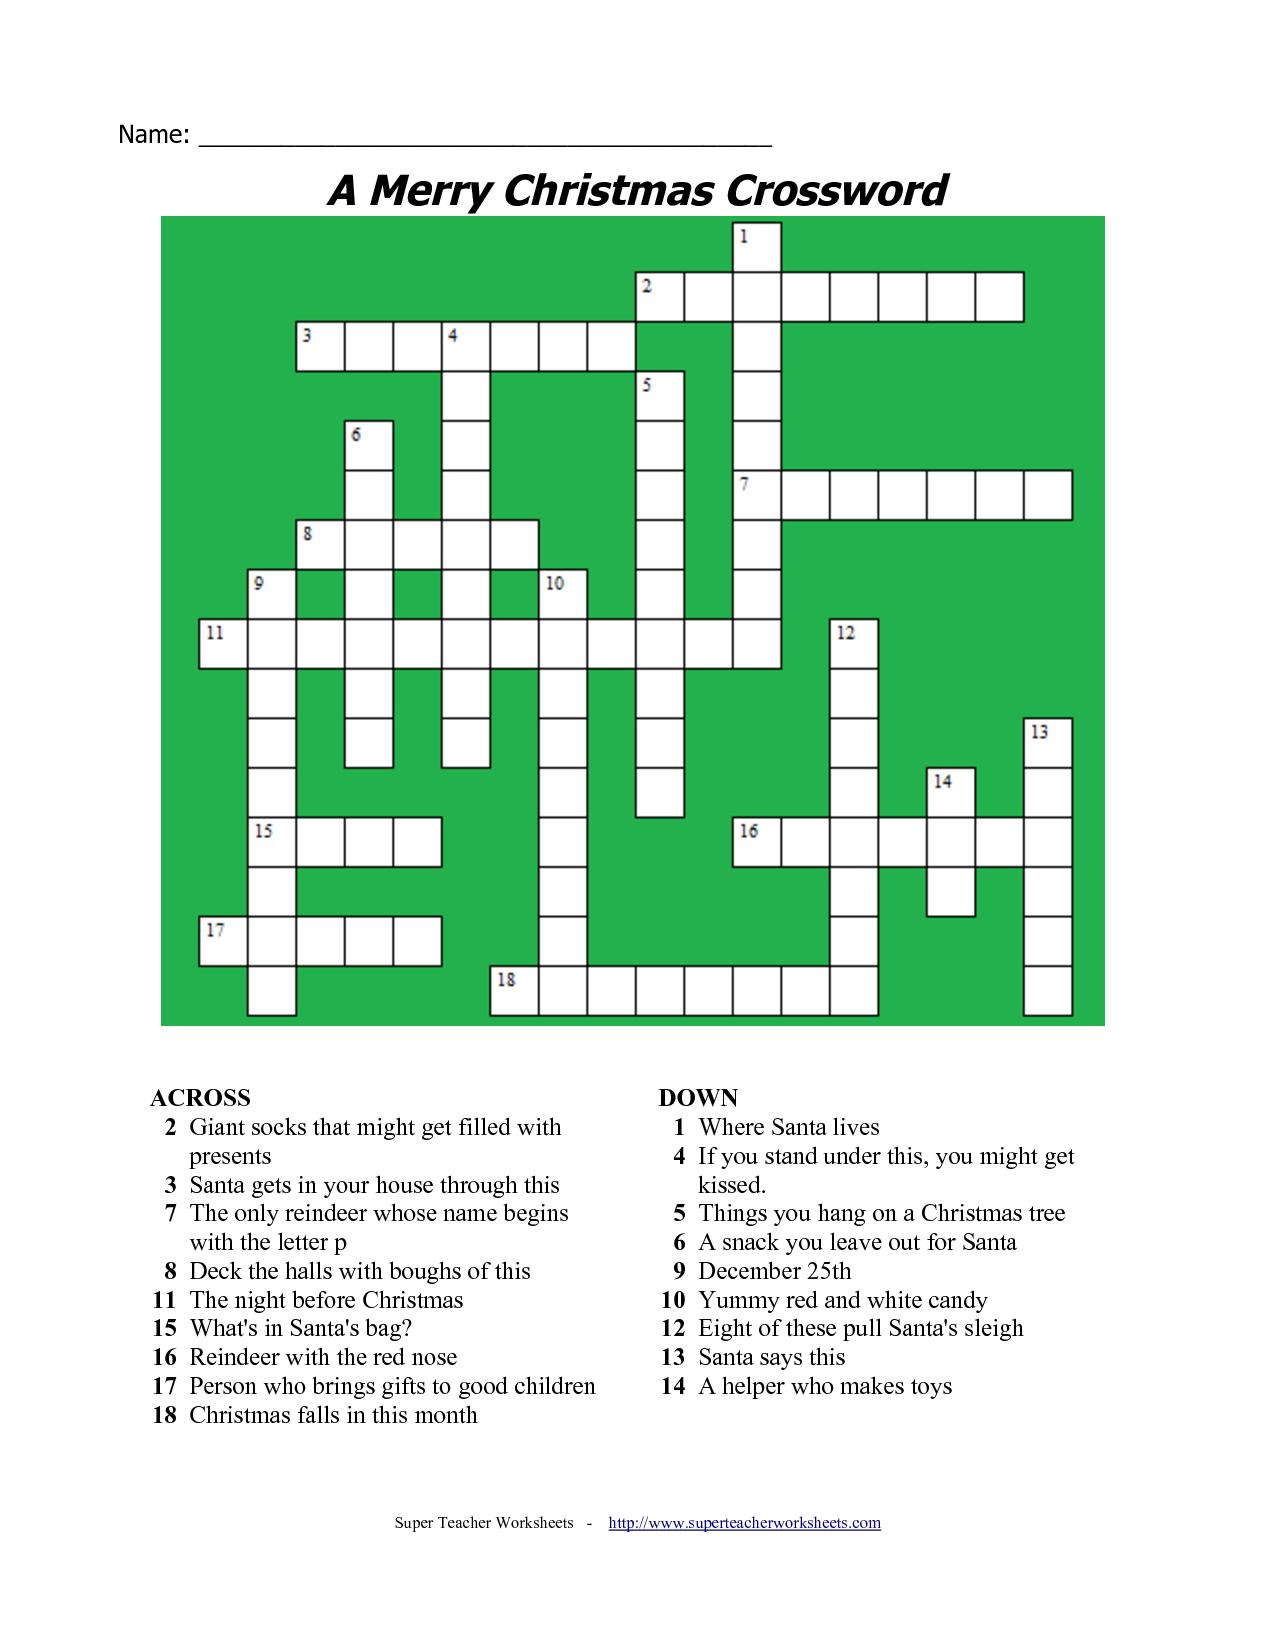 20 Fun Printable Christmas Crossword Puzzles | Kittybabylove - Printable Puzzles Christmas